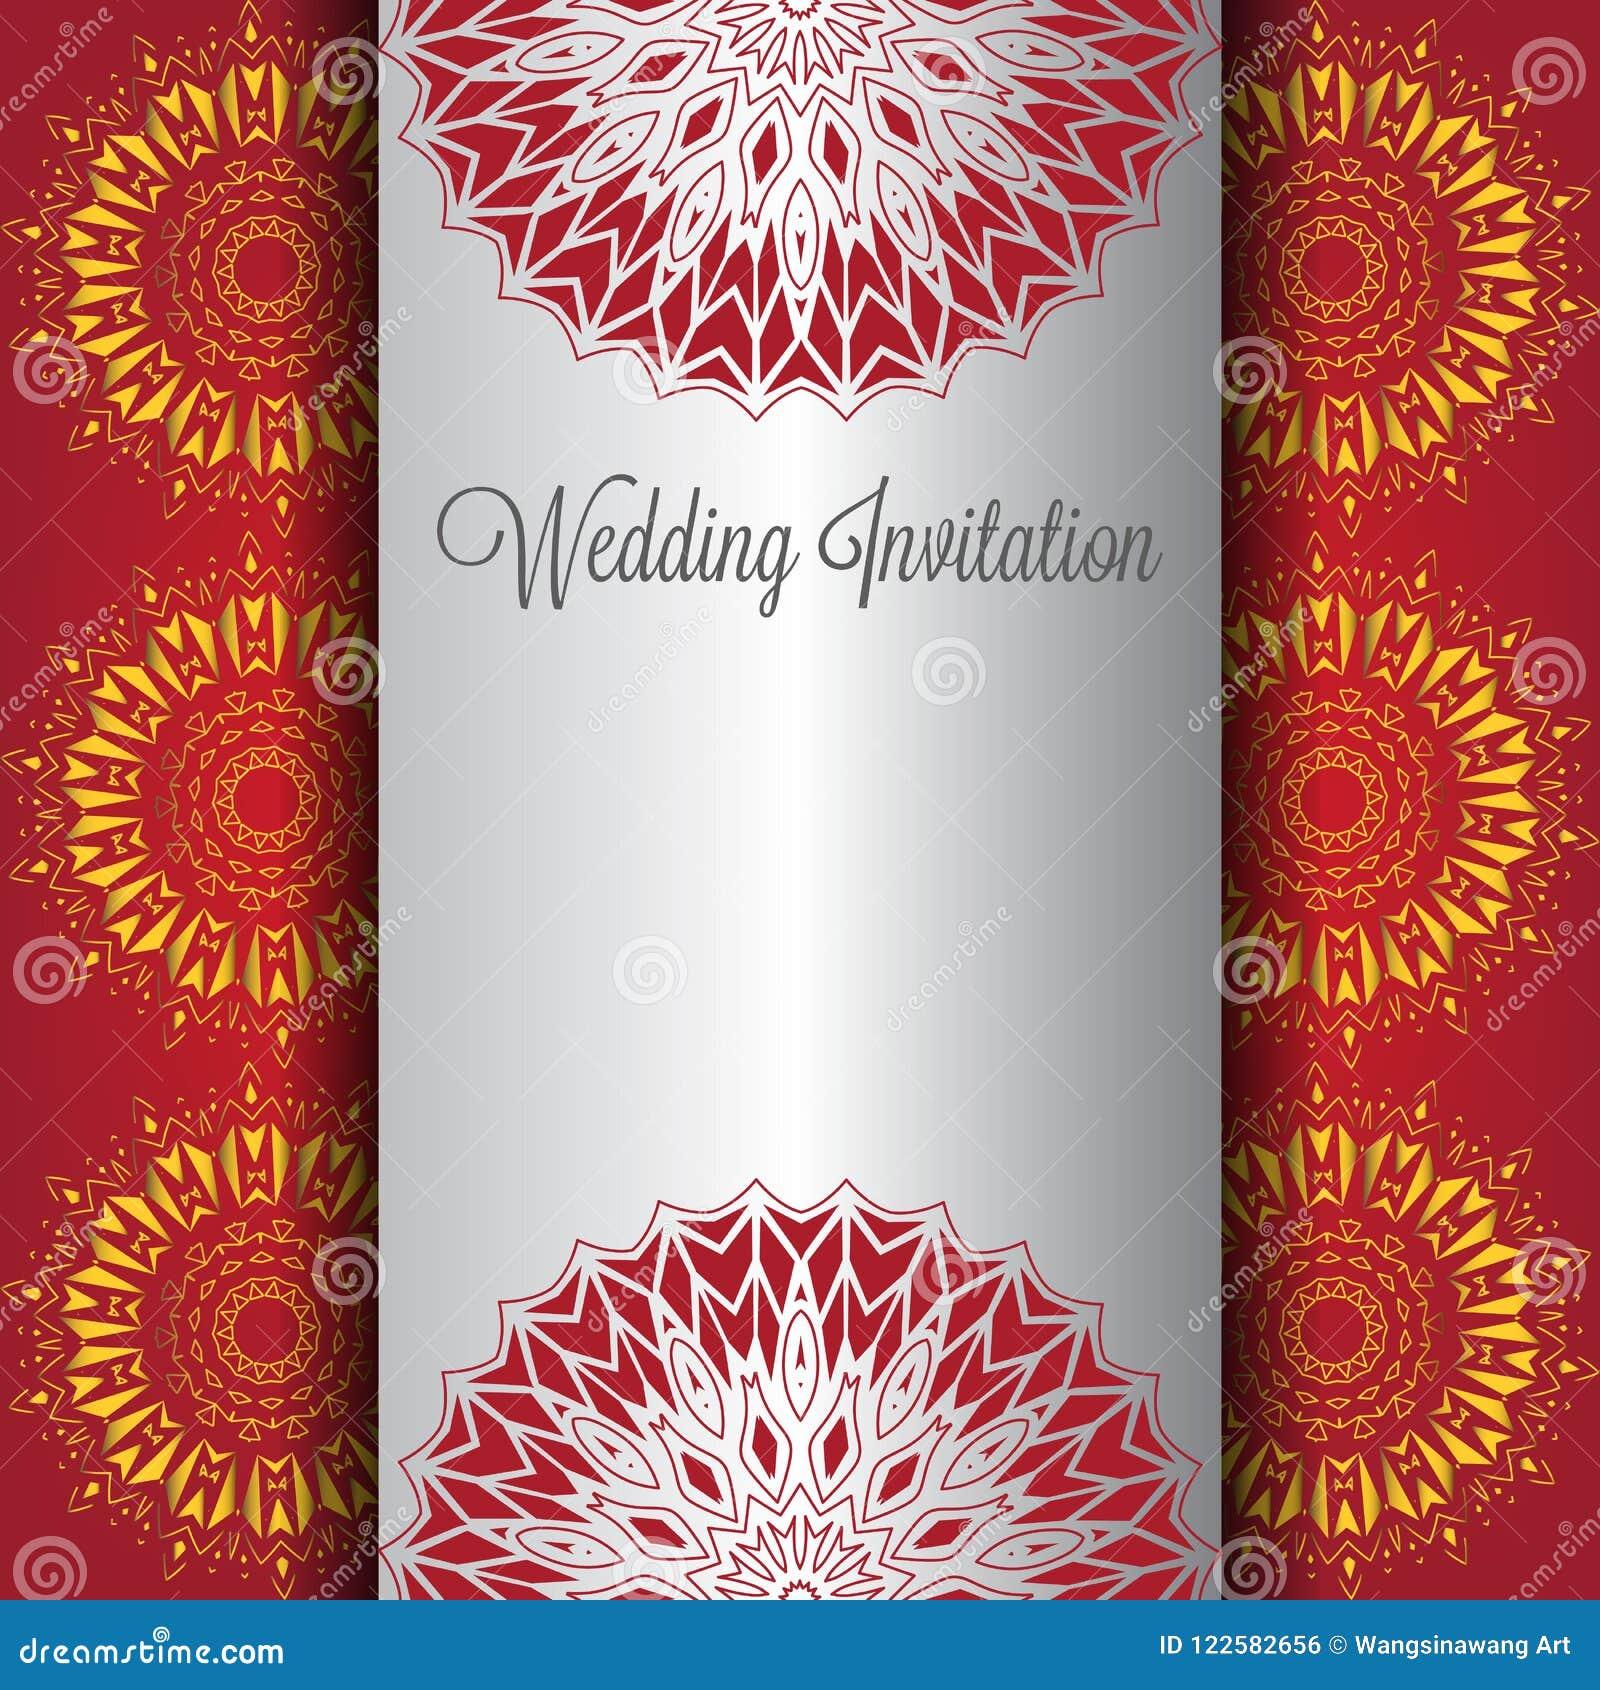 Gold Wedding Invitation Background With Mandala Ornament. Stock ...